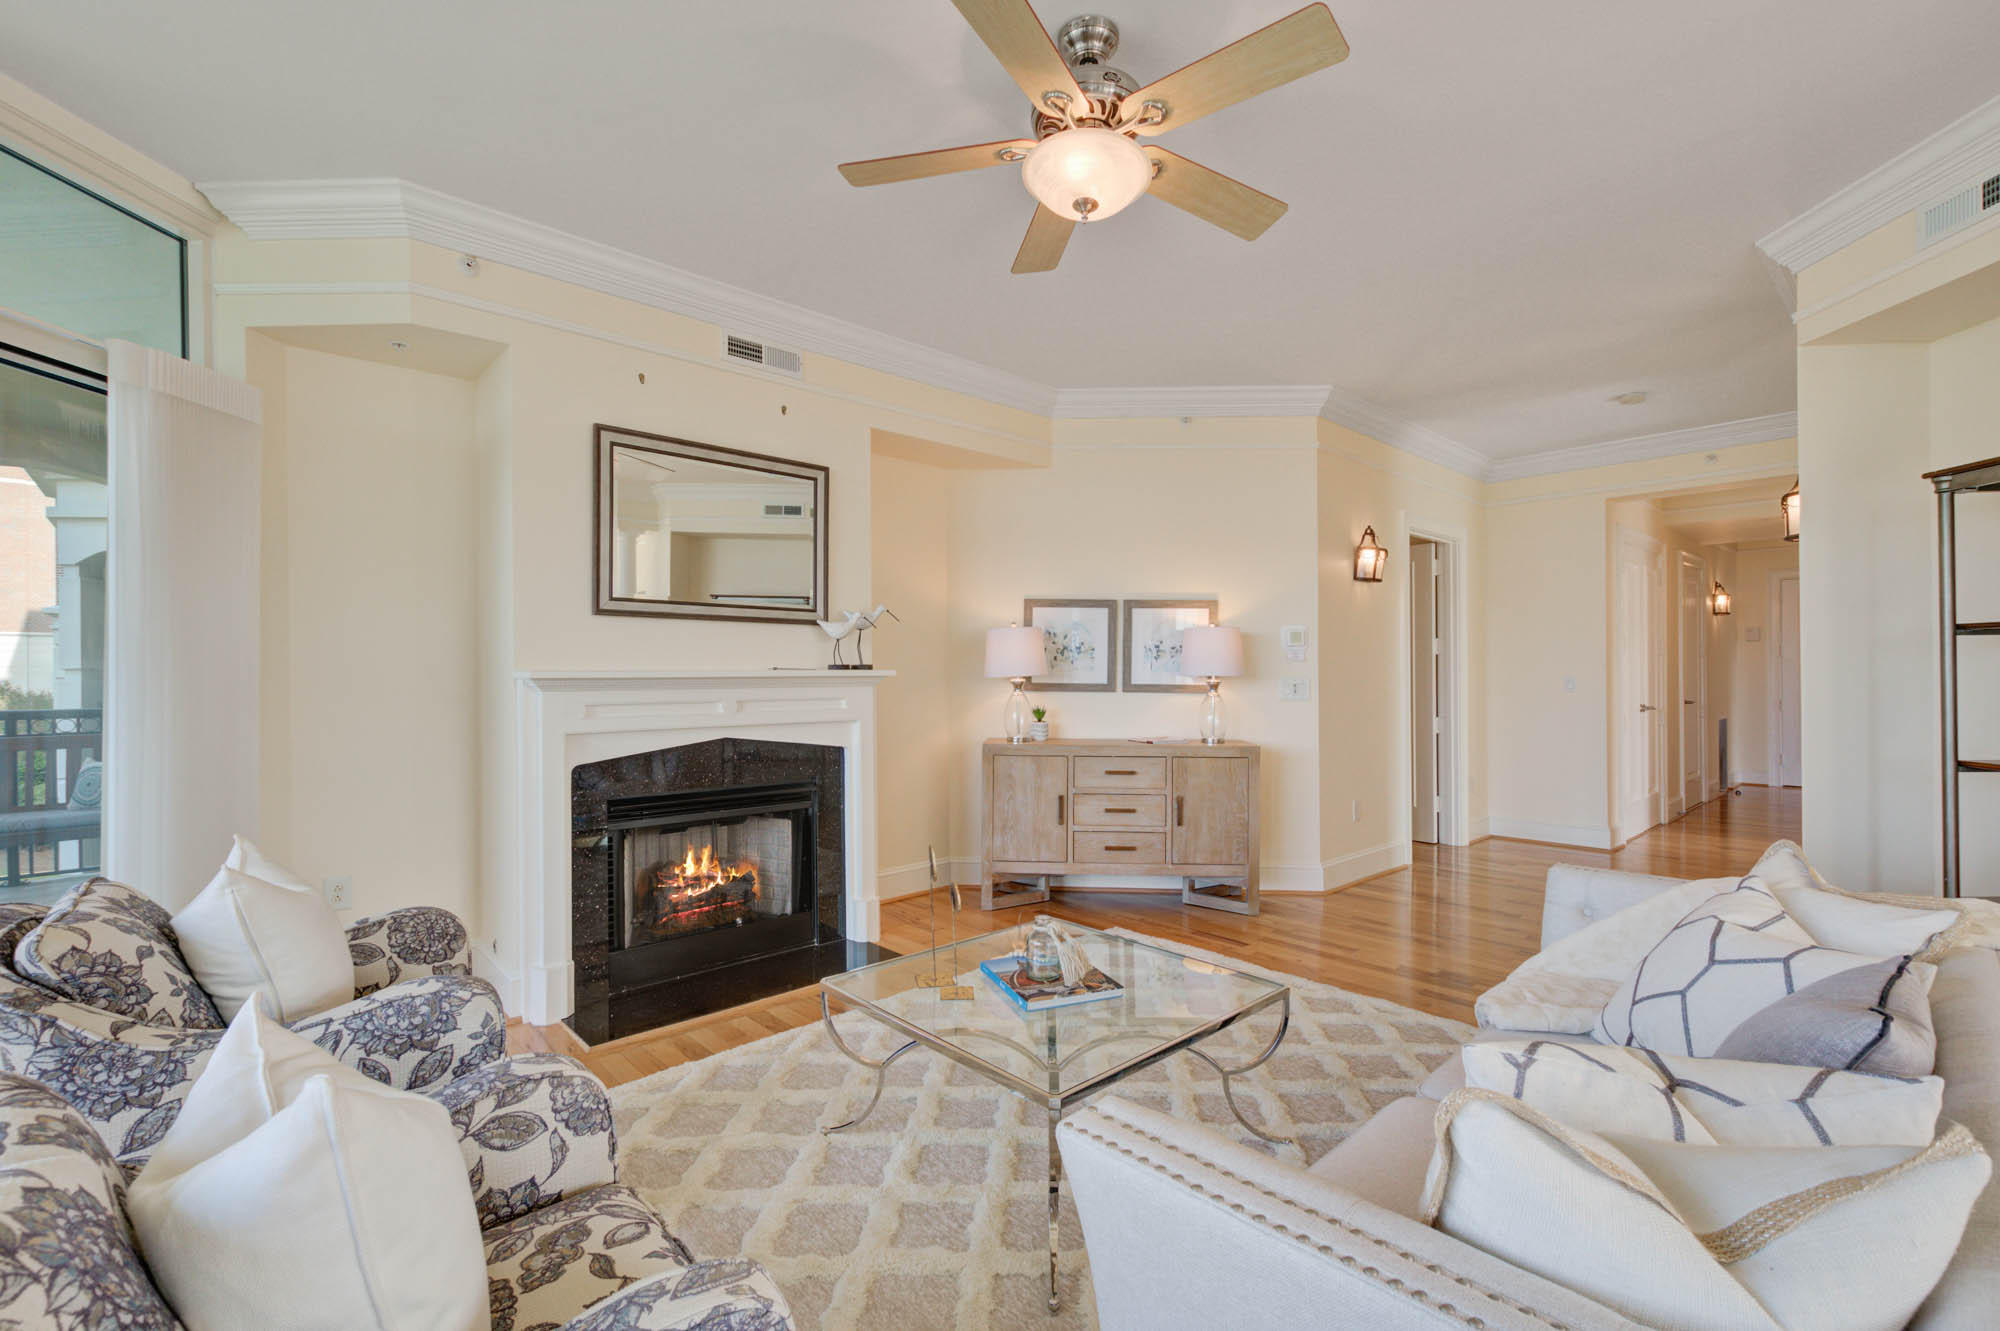 Renaissance On Chas Harbor Homes For Sale - 125 Plaza, Mount Pleasant, SC - 24